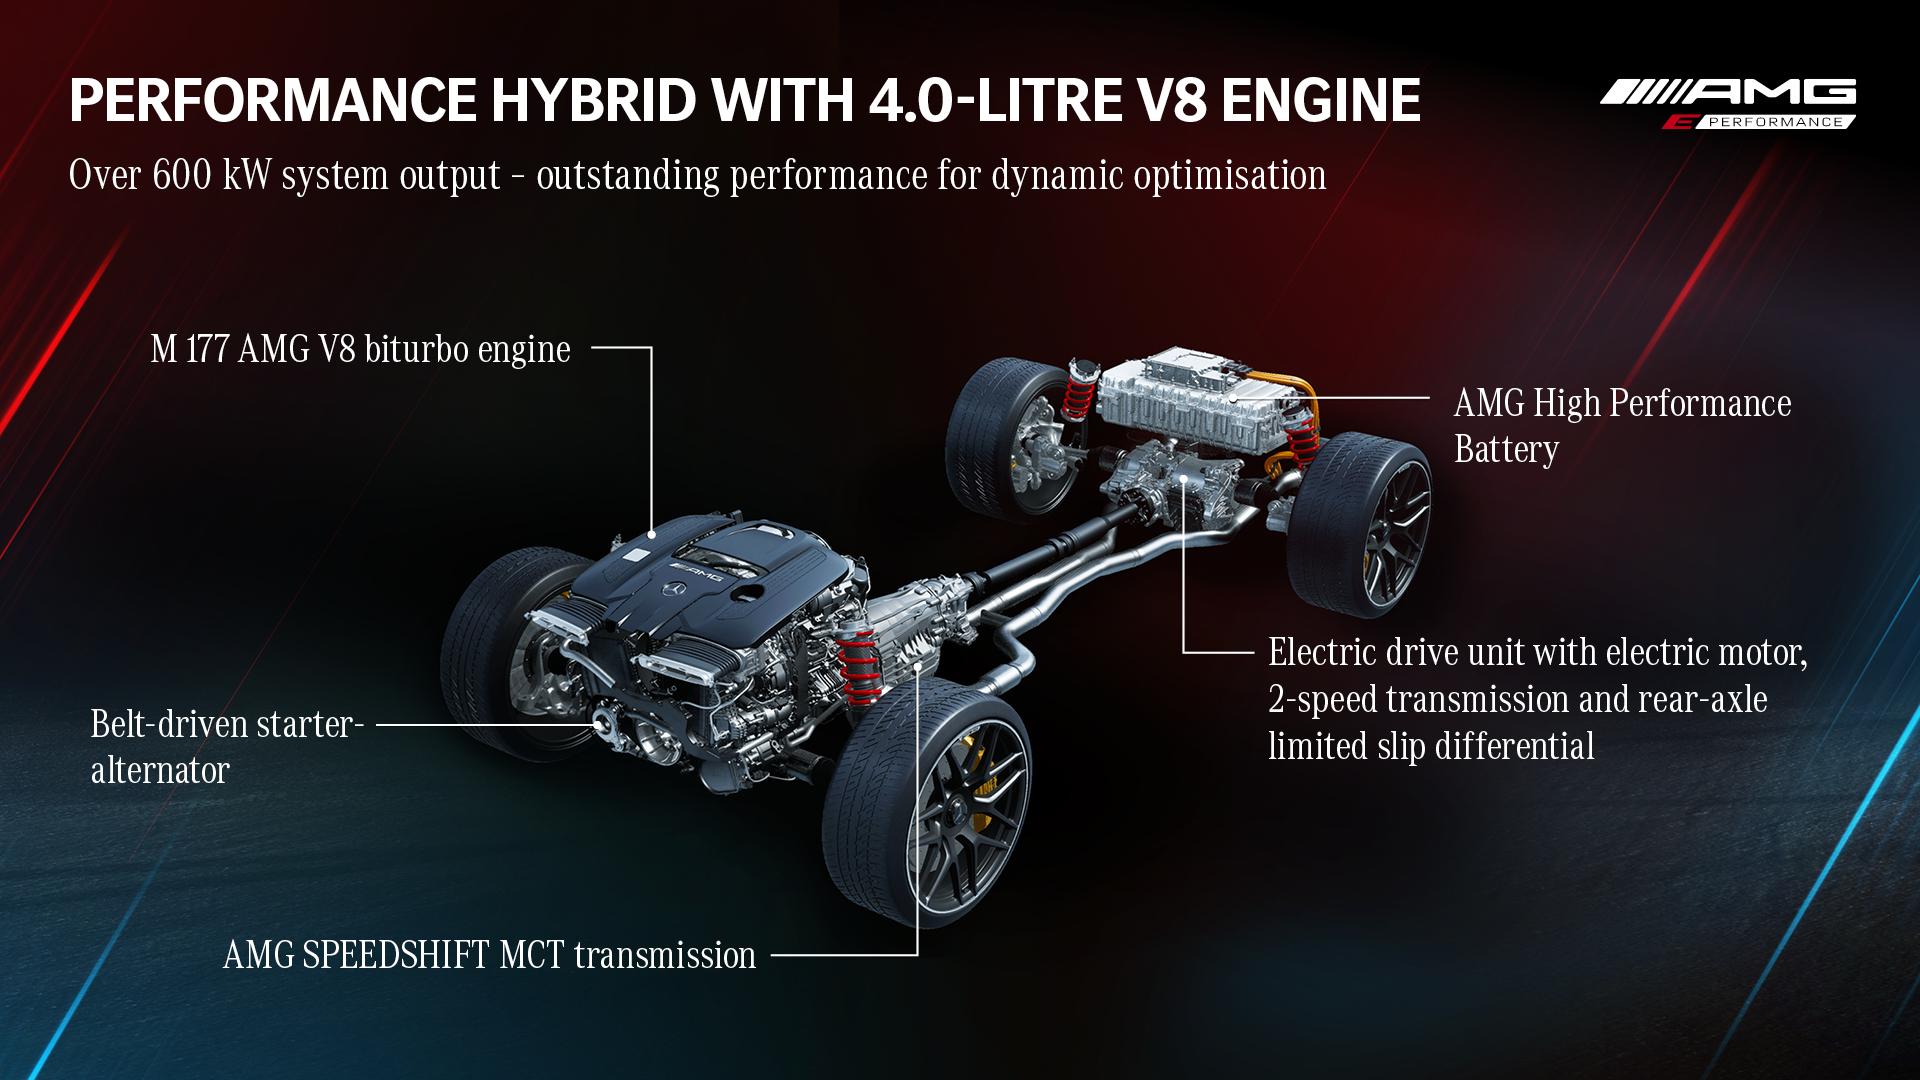 TecDAY AMG Future of Driving Performance Eigenständige E PERFORMANCE Antriebsstrategie für Performance-Hybride // TecDAY AMG Future of Driving Performance Independent E PERFORMANCE drivetrain strategy for performance hybrids